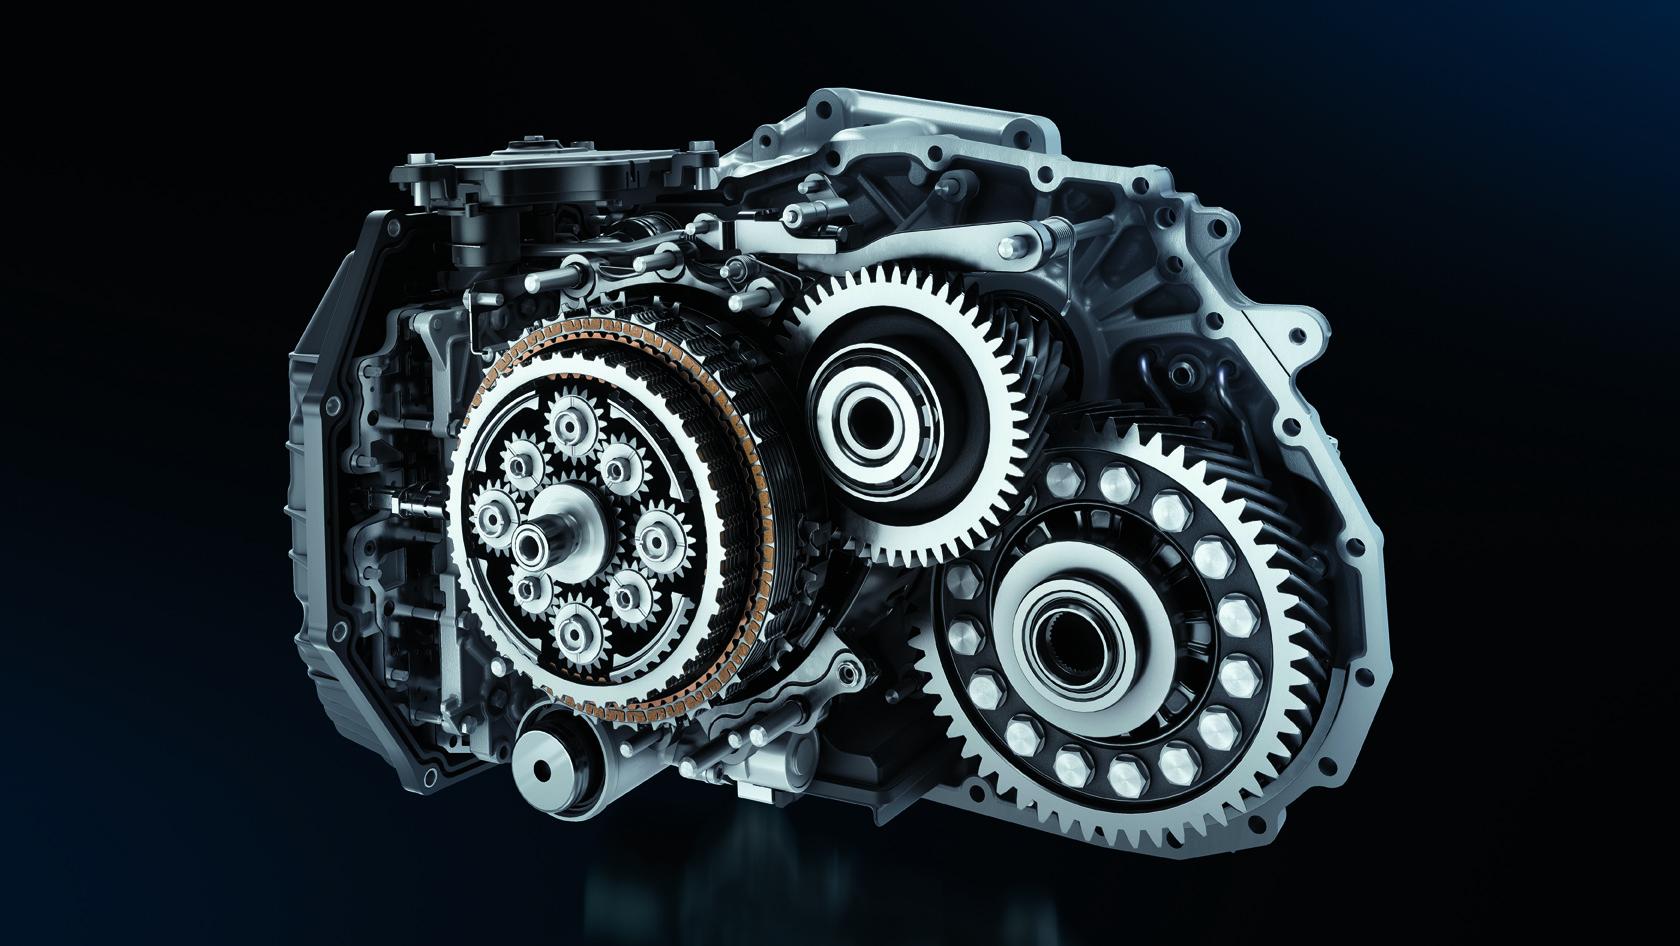 Peugeot - 2018 - gearbox - EAT8 - Efficient Automatic Transmission 8 - mechanical